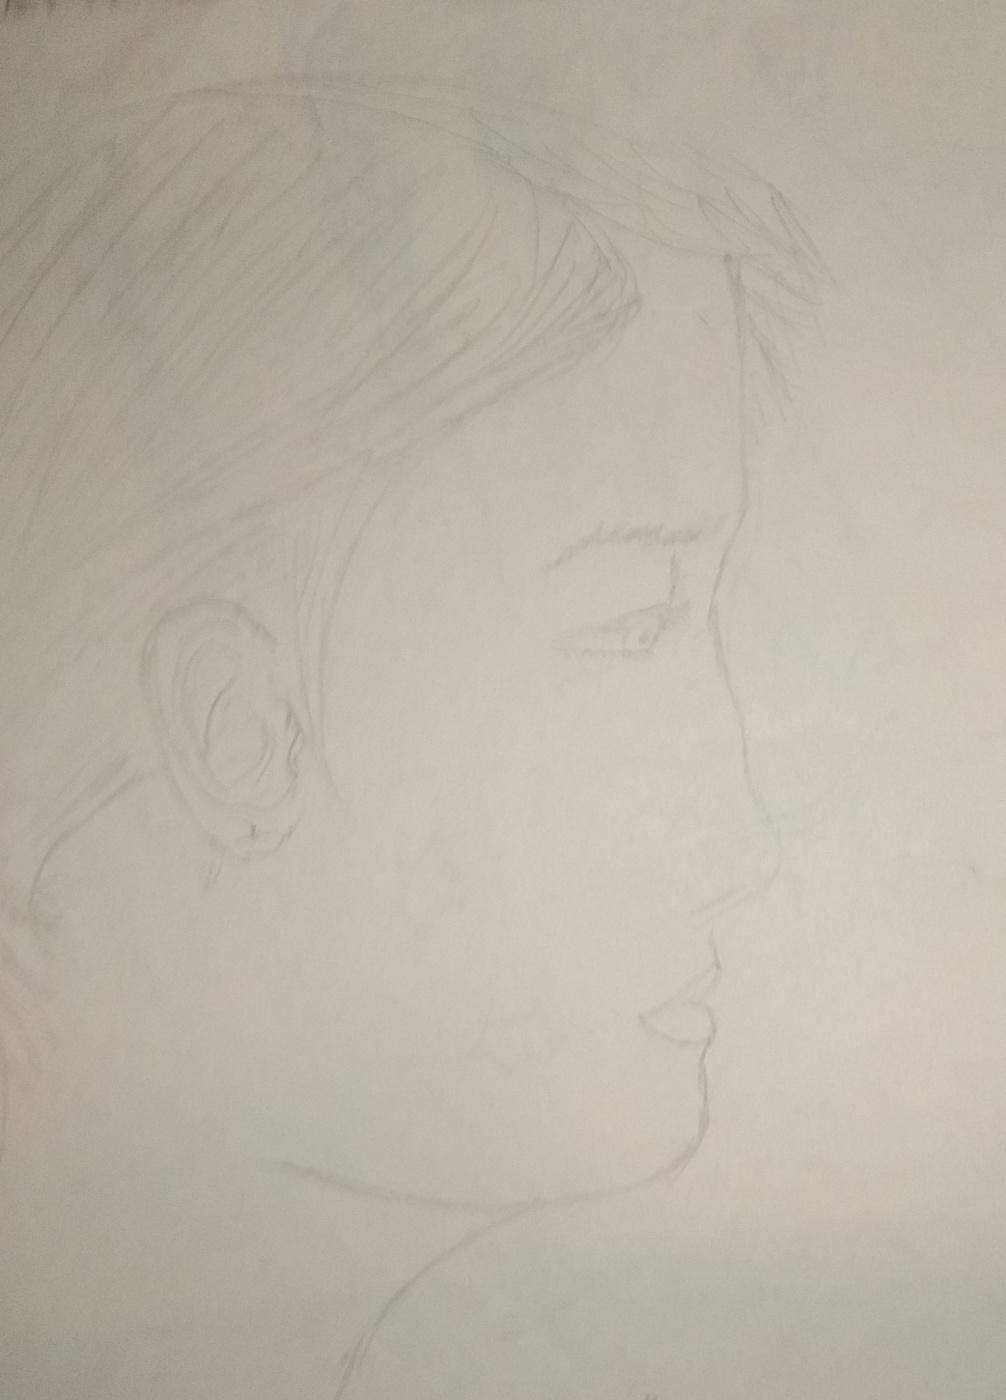 Zina Vladimirovna Parisva. Girl 3. Sketch